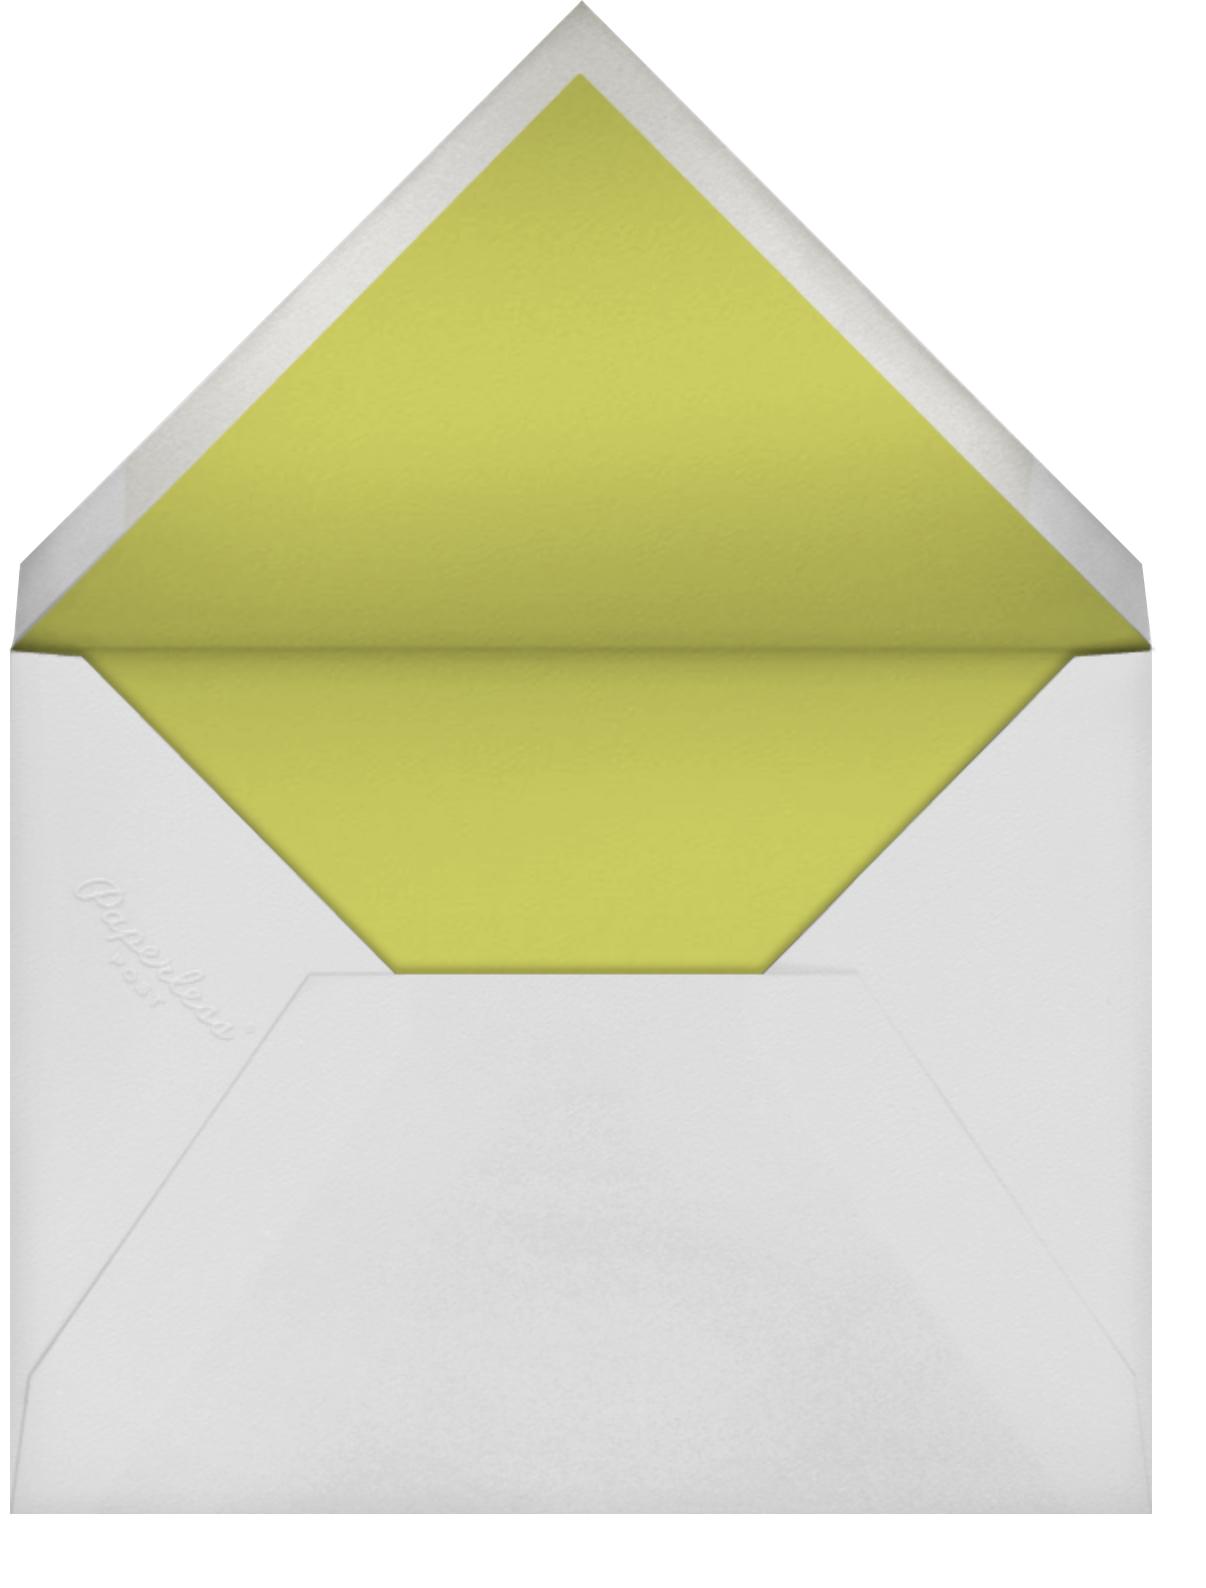 Cool Cat - Rifle Paper Co. - Envelope